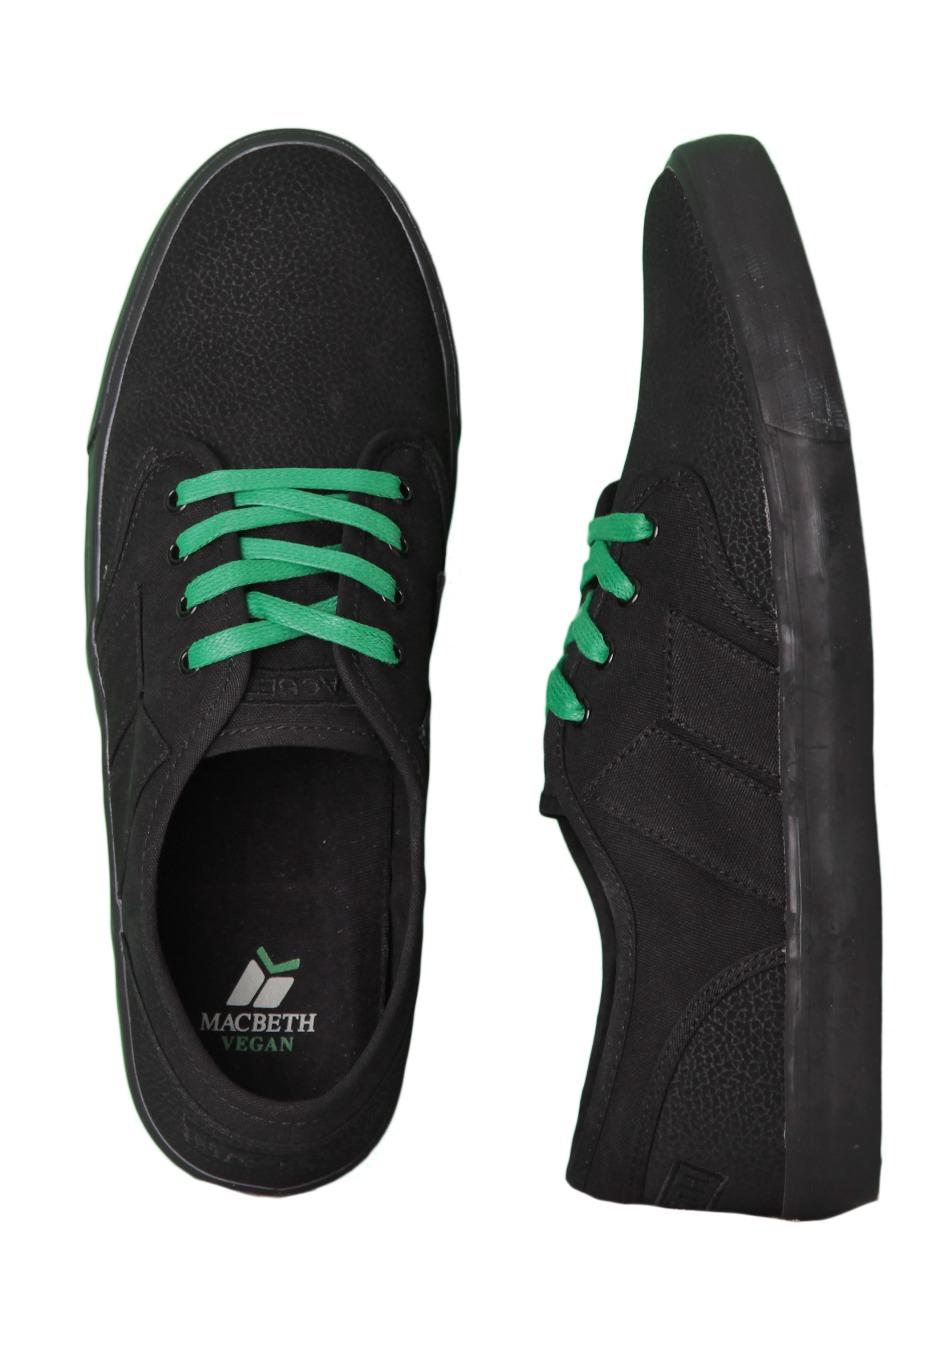 Macbeth   Langley Black Black Classic Canvas   Shoes   Impericon com  Worldwide. Macbeth   Langley Black Black Classic Canvas   Shoes   Impericon